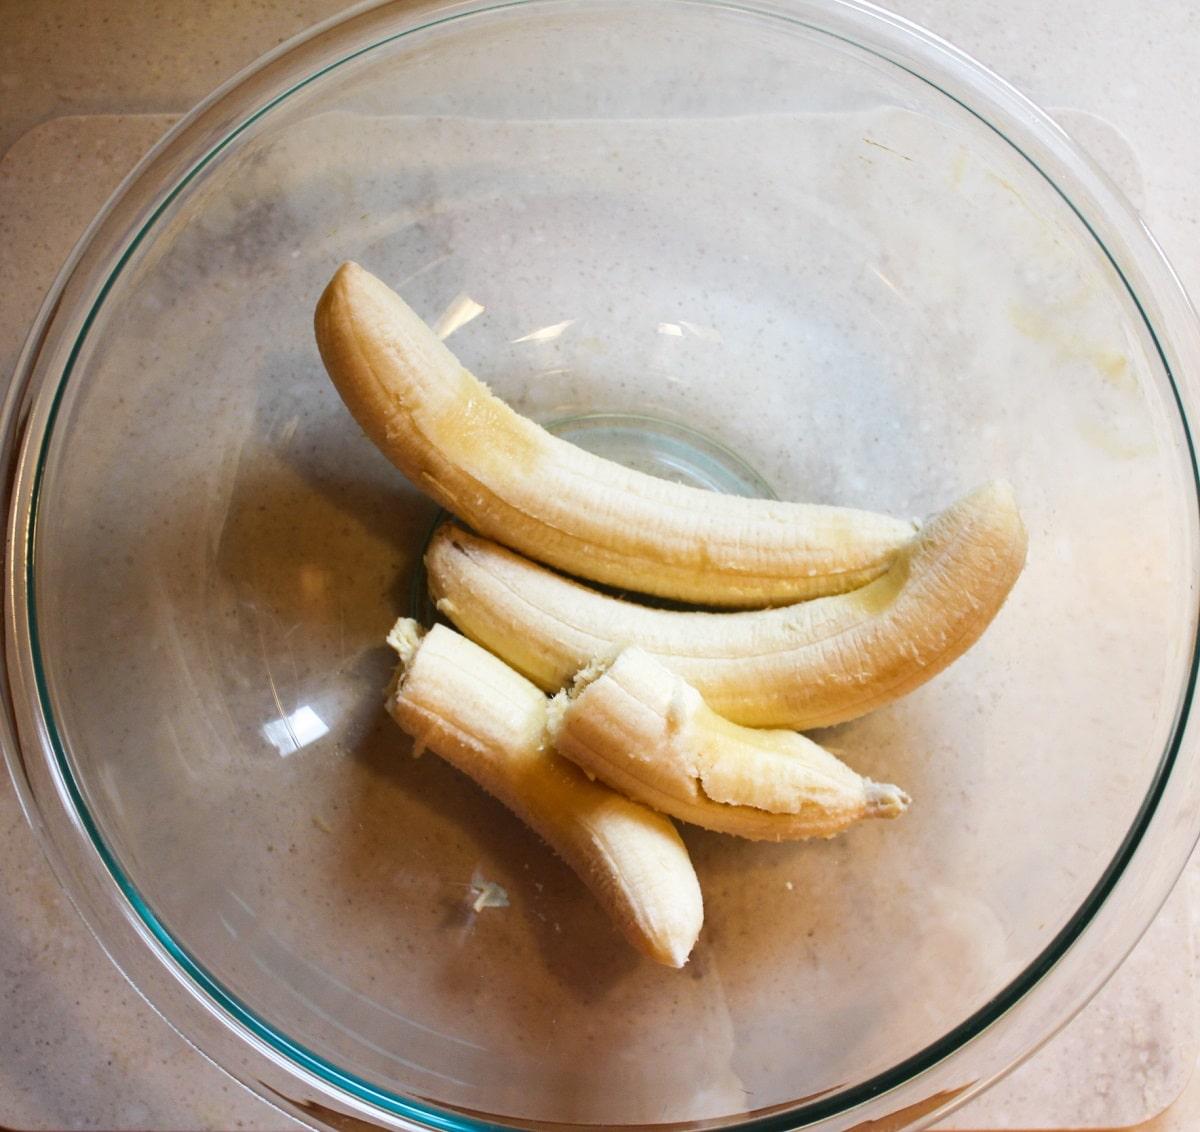 banana bread baked oatmeal preparation photo